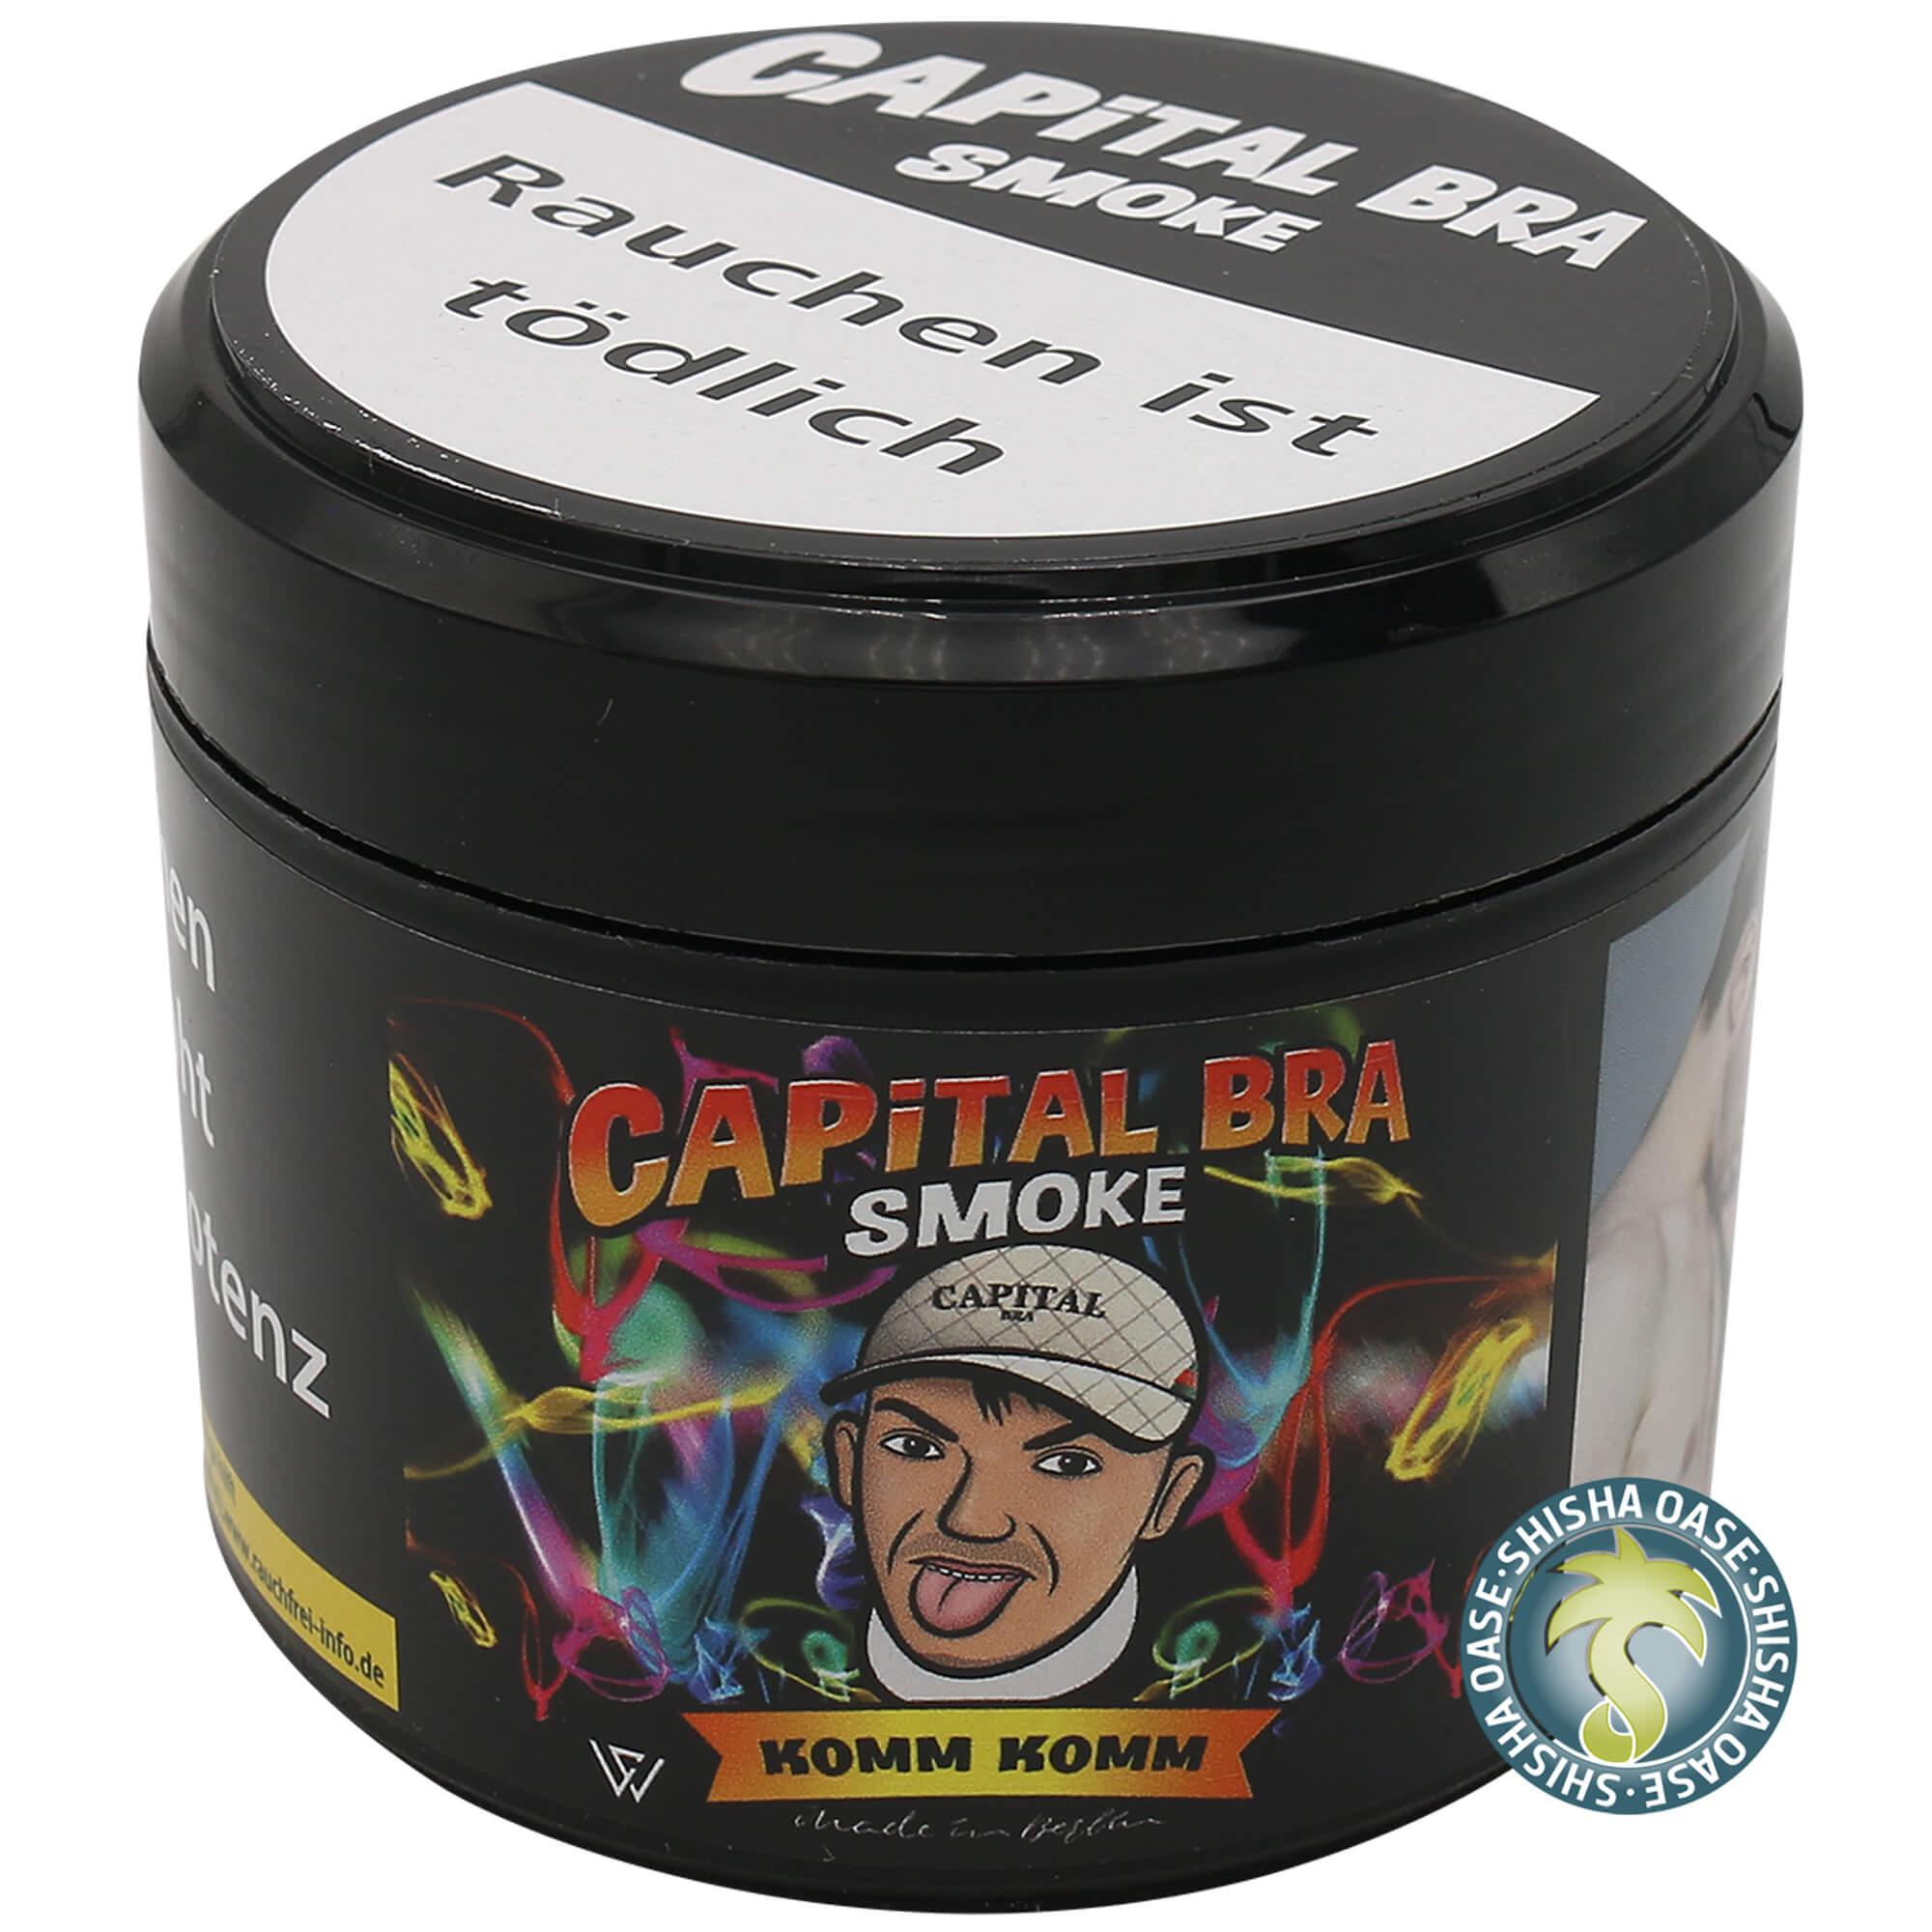 Capital Bra Tabak | Komm Komm 200g